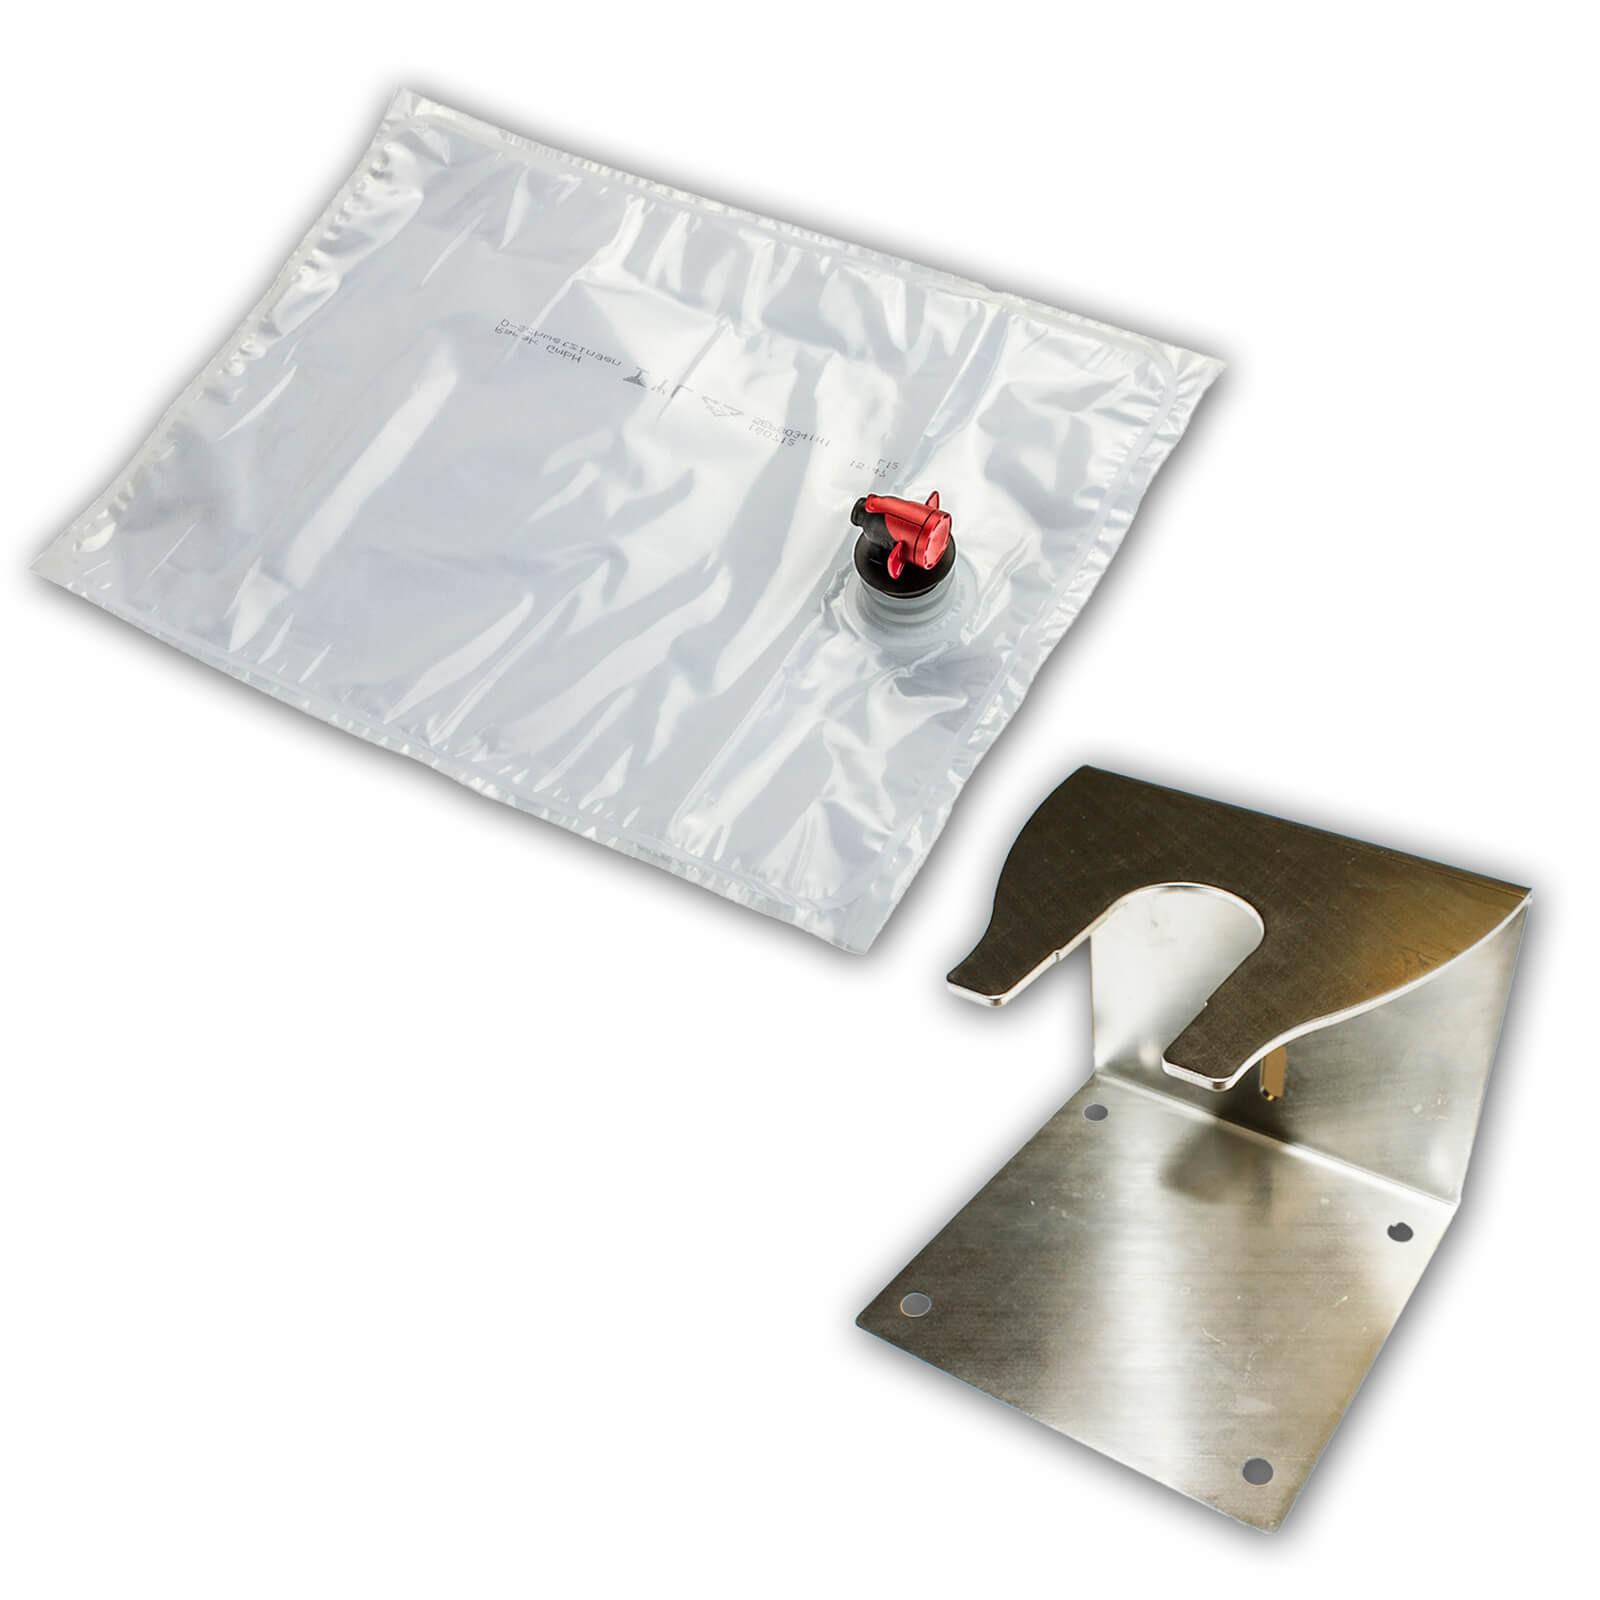 bag in box edelstahl abf llhalter f r saftbeutel 3 10 liter beutelhalter 10 cm ebay. Black Bedroom Furniture Sets. Home Design Ideas